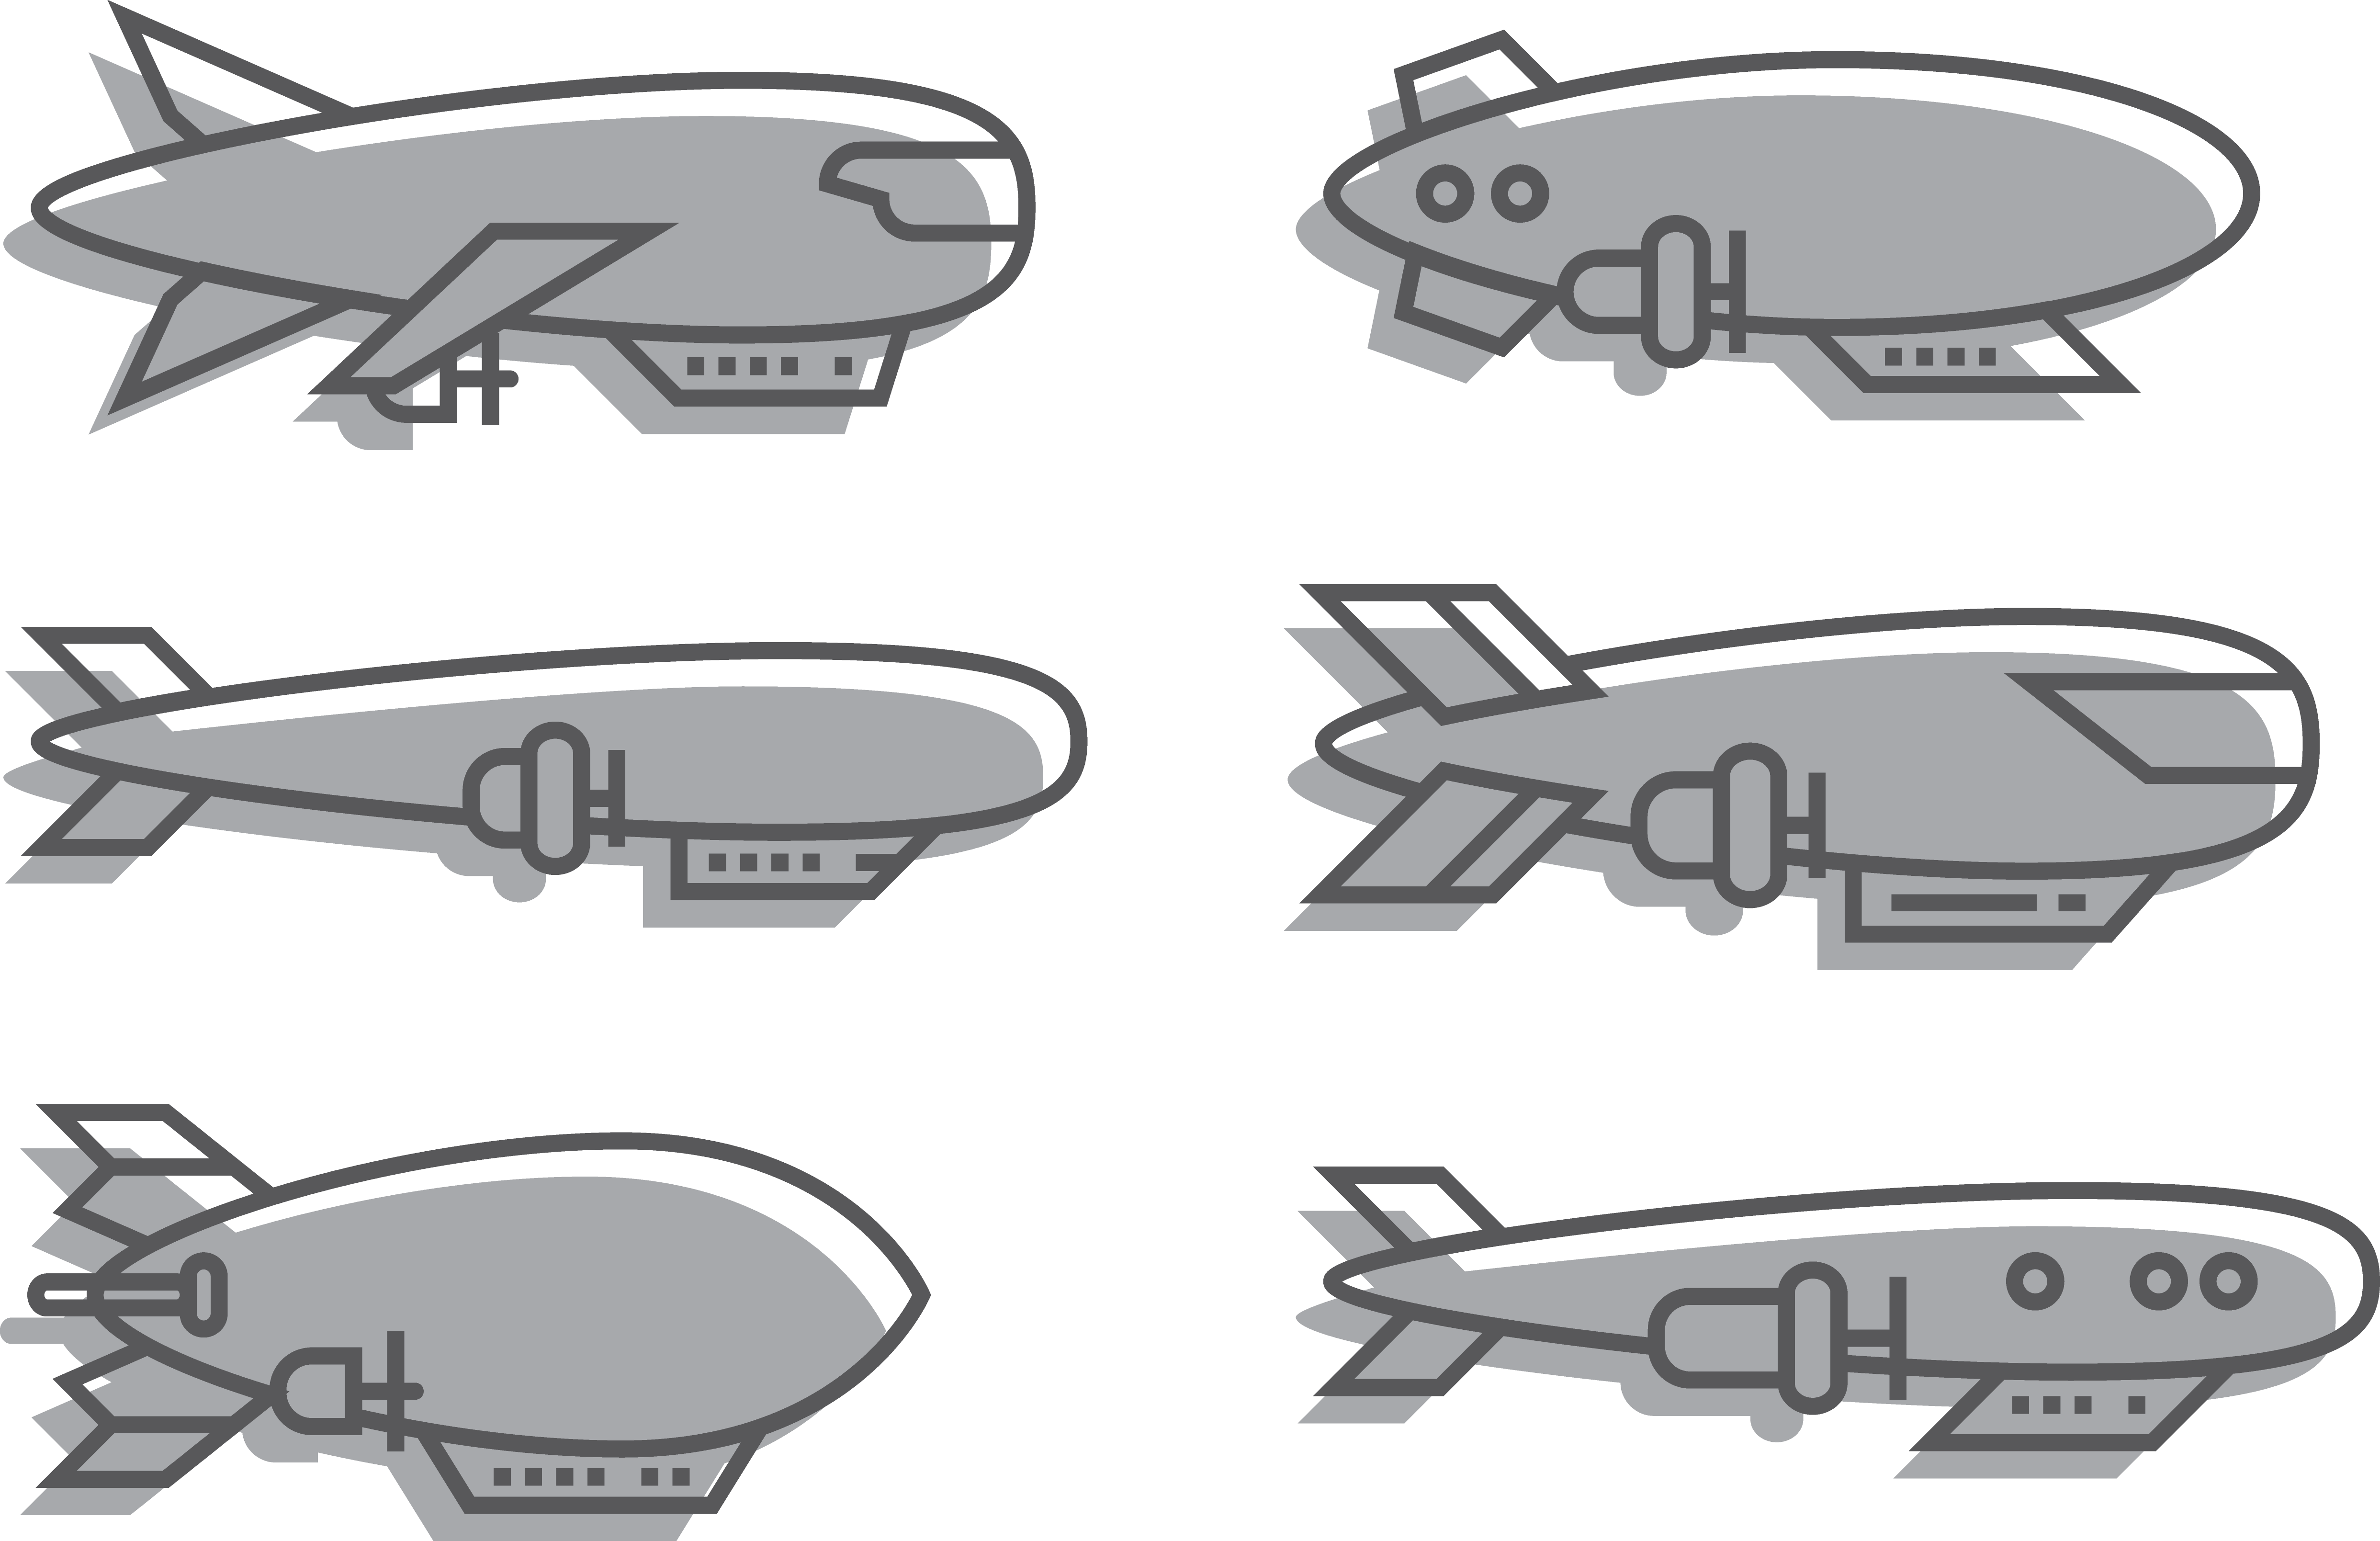 jpg transparent library Blimp drawing.  airship semi rigid